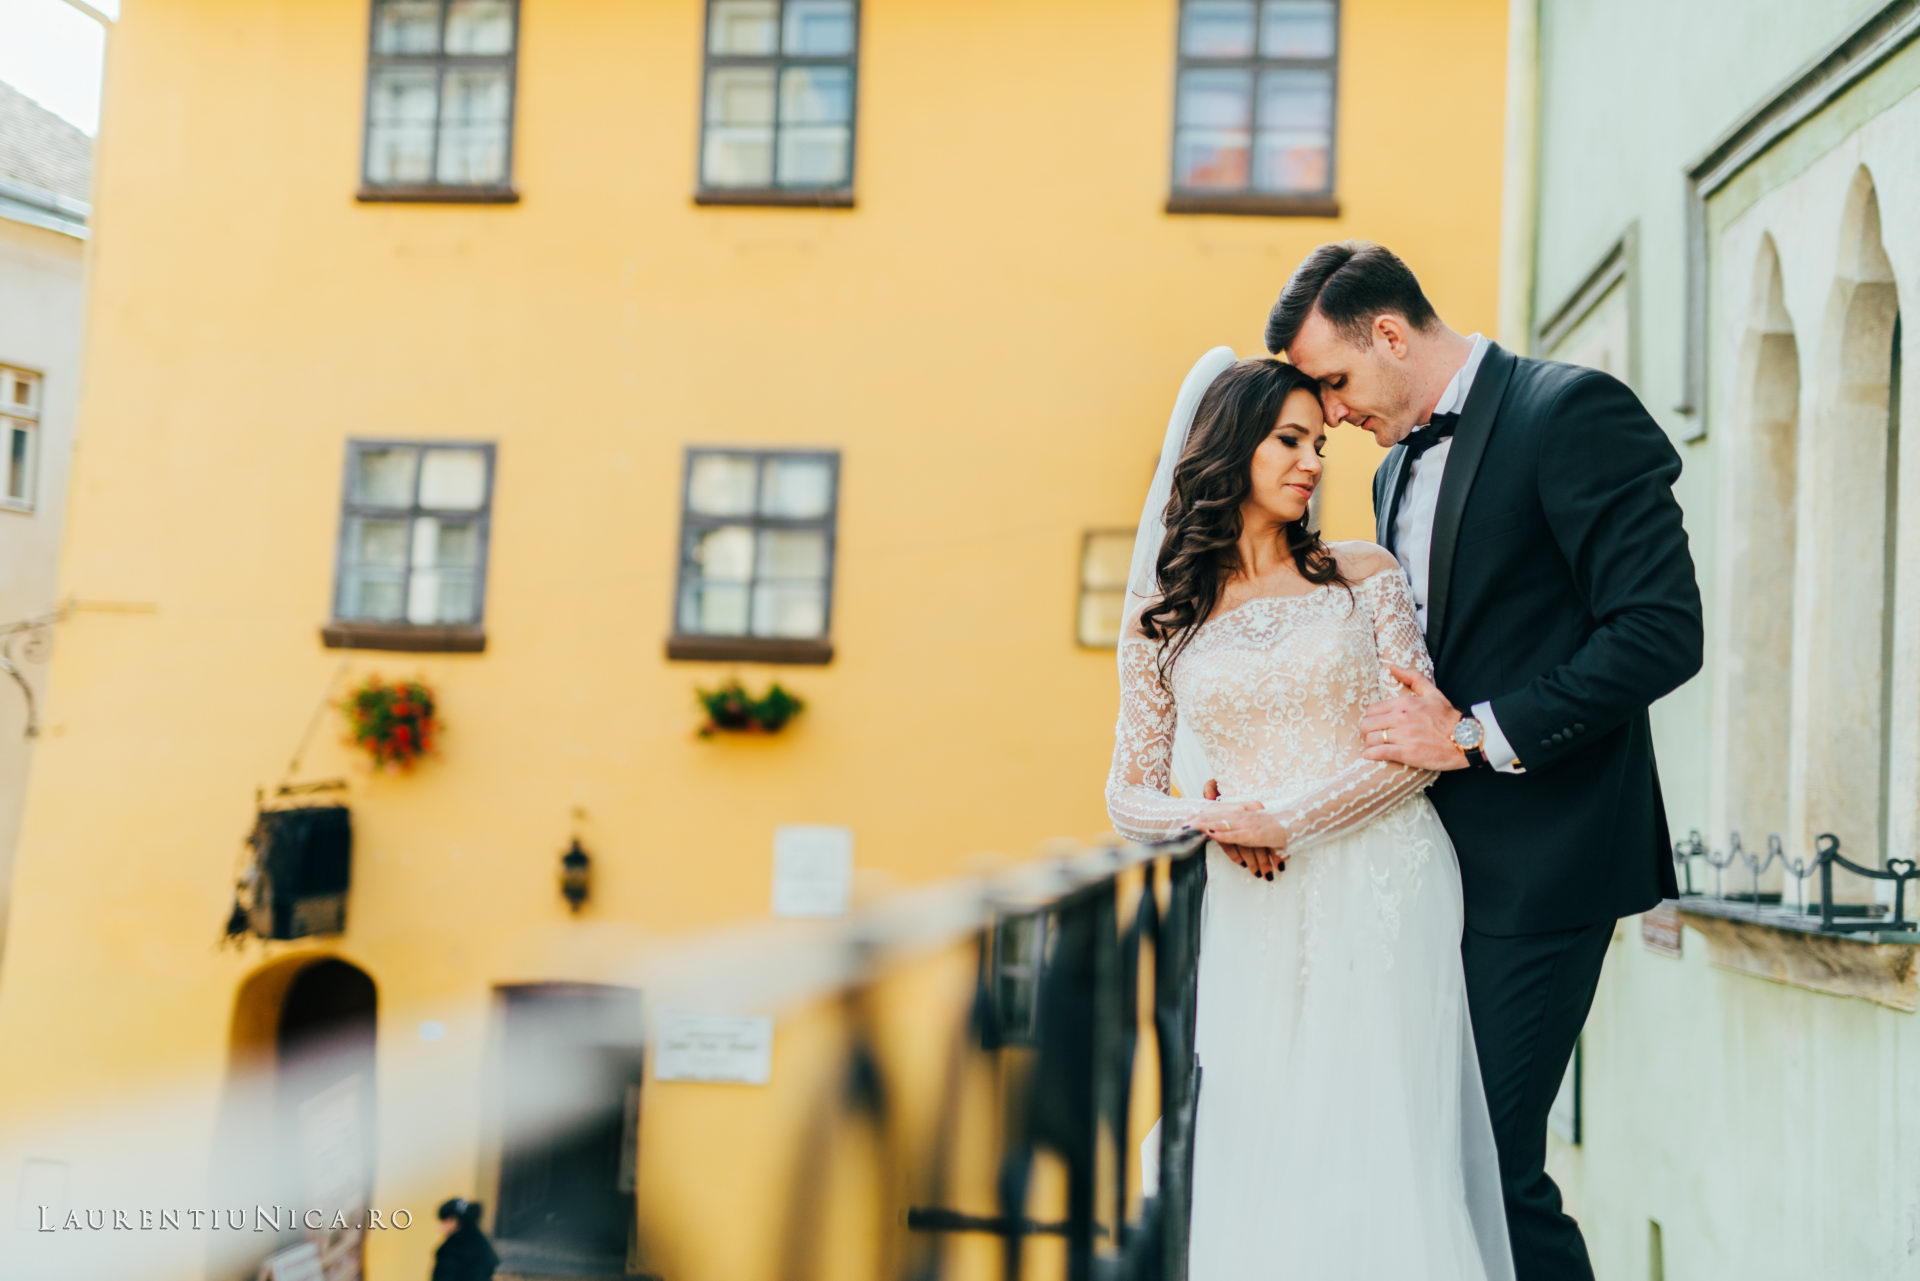 lili-si-dan-fotografii-nunta-after-wedding-sighisoara-laurentiu-nica09